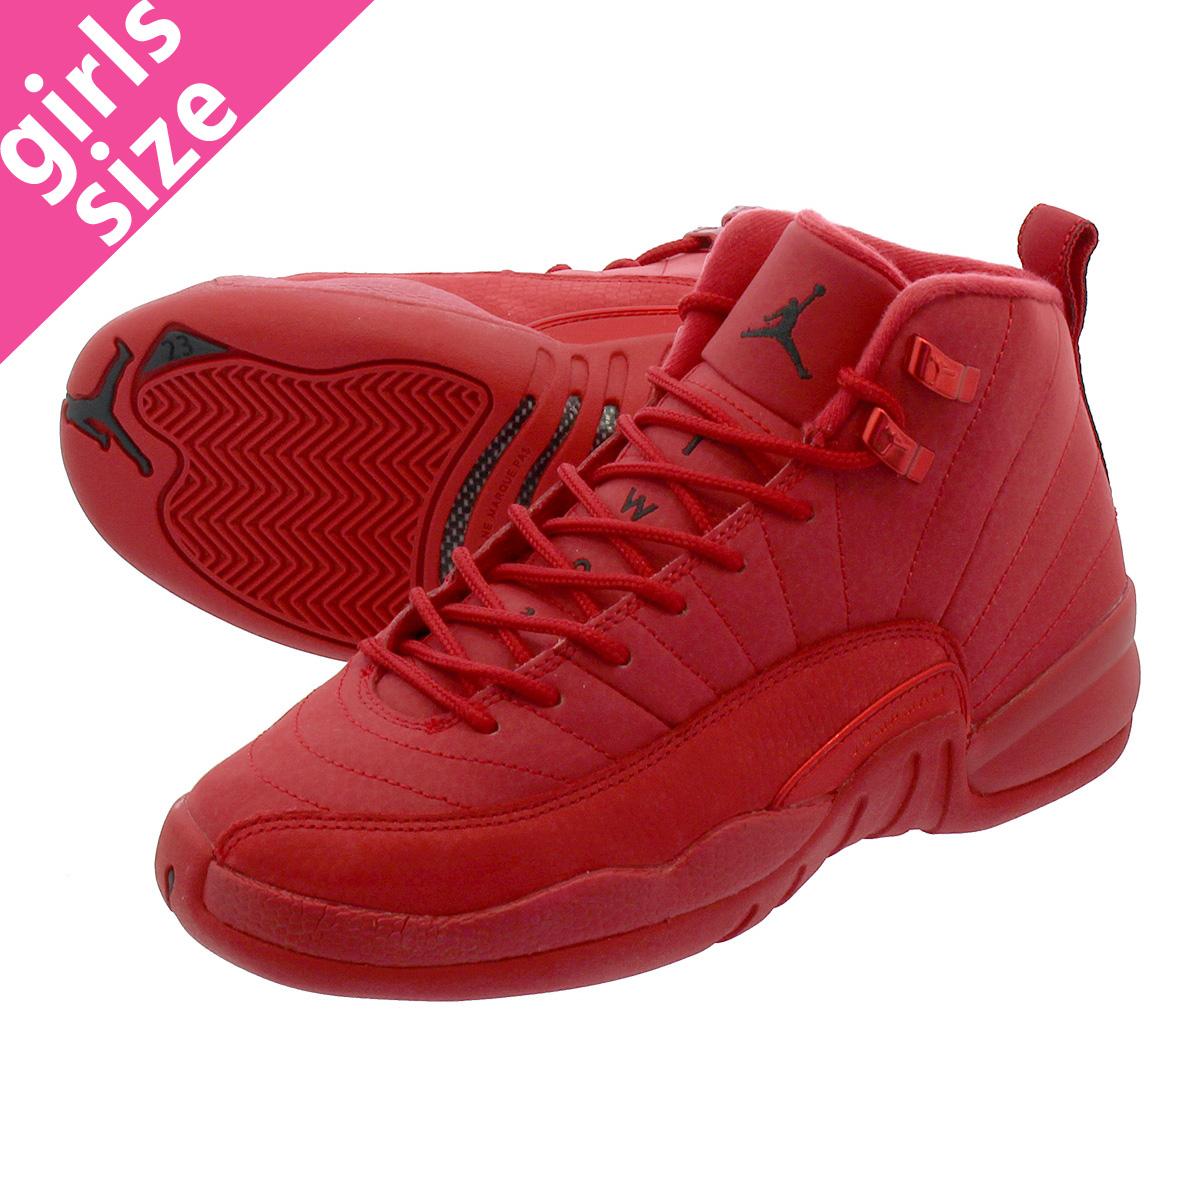 aca99b0f9a03 NIKE AIR JORDAN 12 RETRO GS Nike Air Jordan 12 nostalgic GS GYM RED BLACK  153